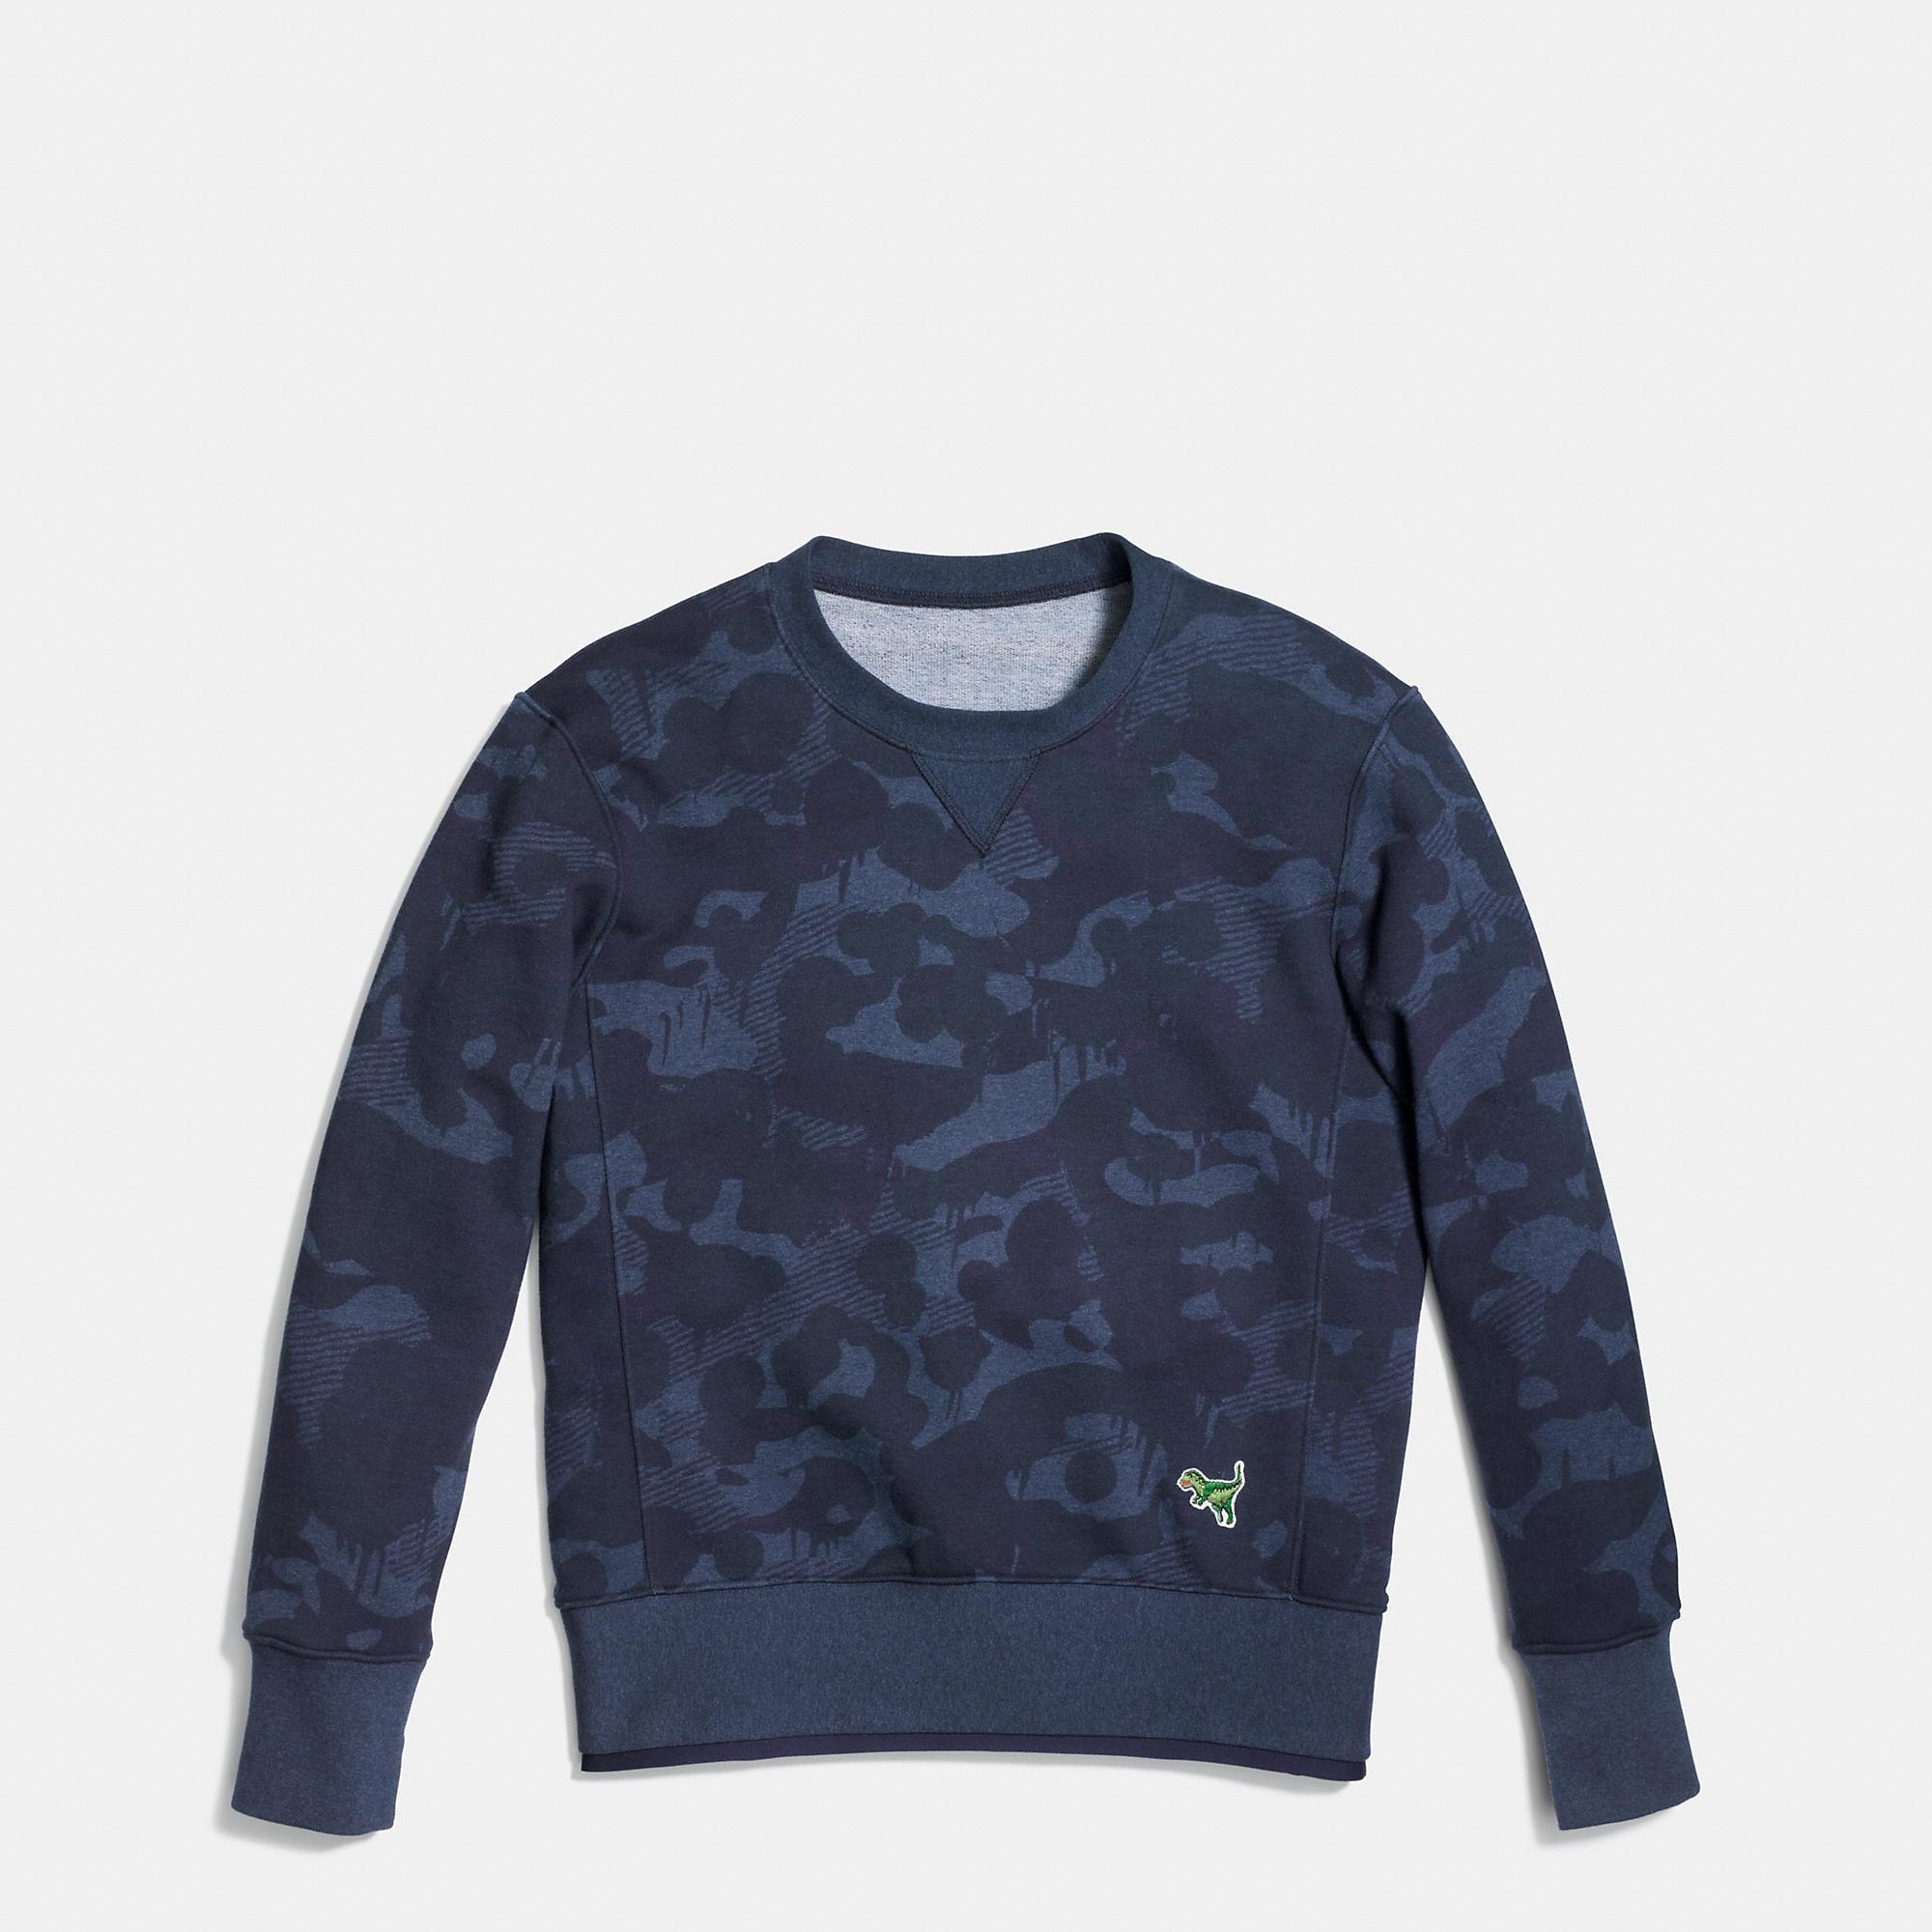 Coach Wild Beast Sweatshirt